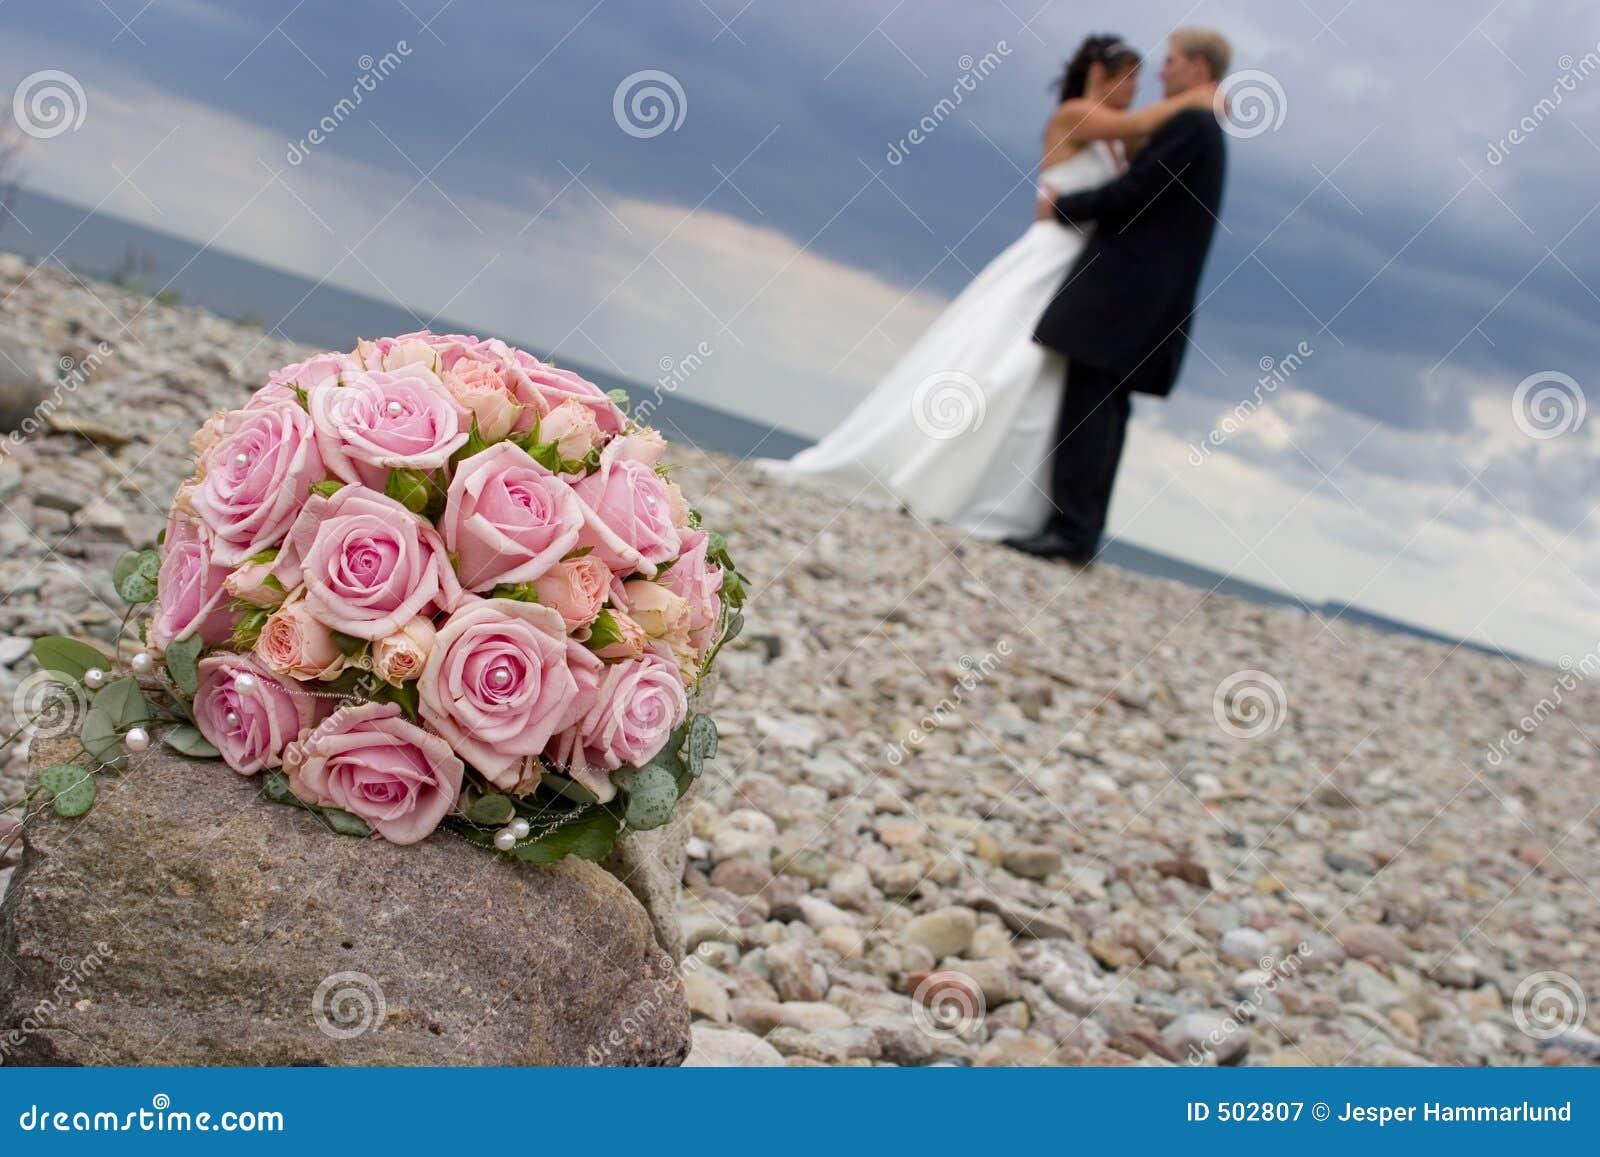 Weddingflowers on a stone. JH